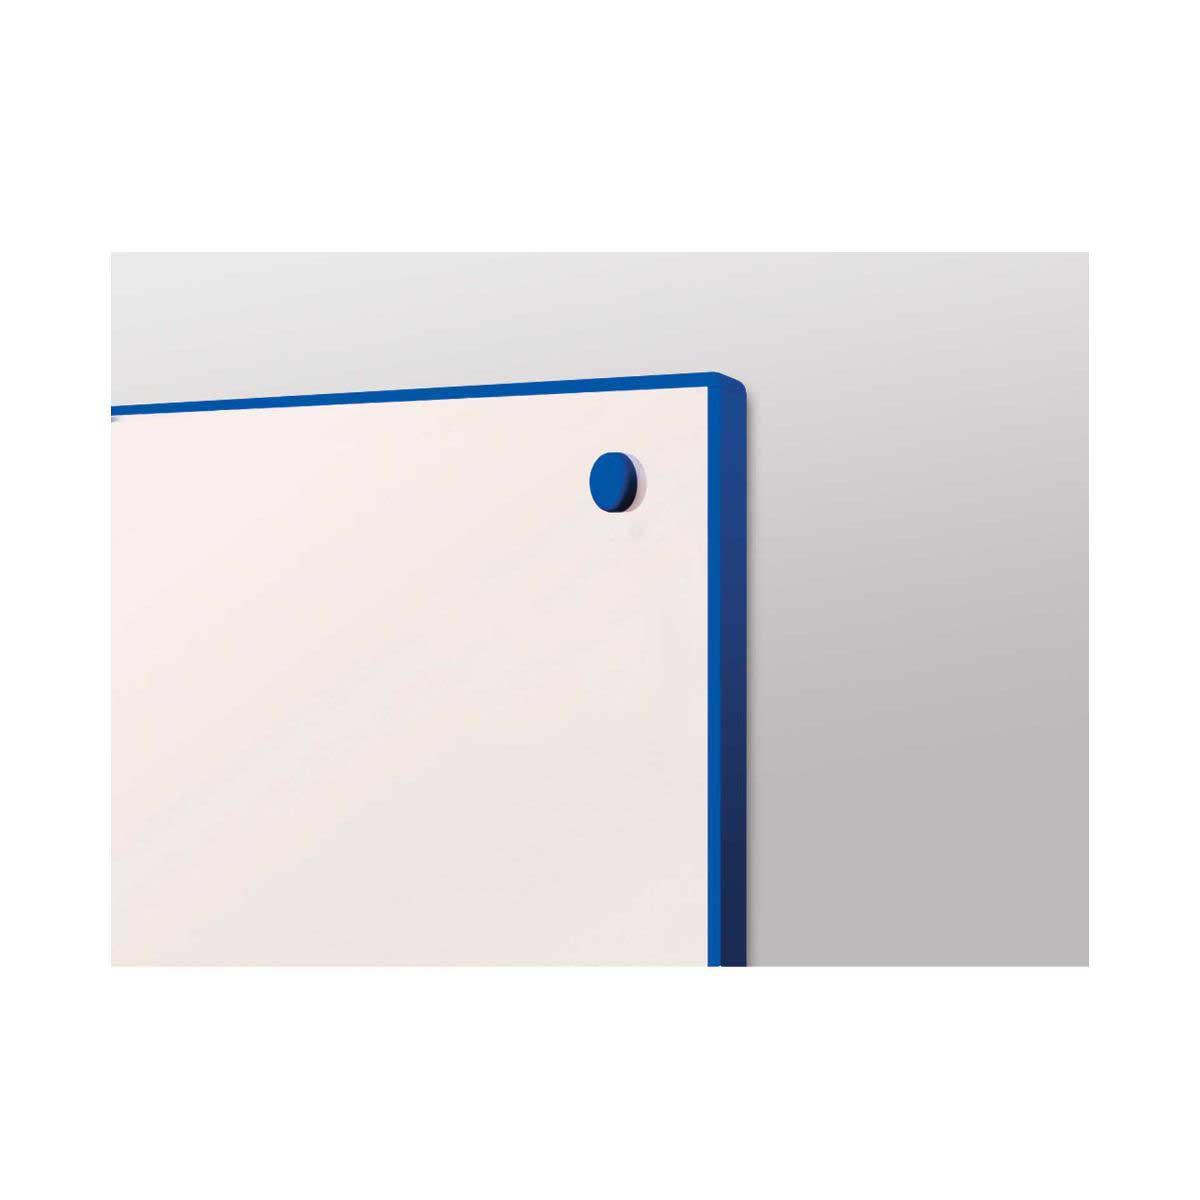 metroplan writeon coloured edge whiteboard 900 x 1200mm, blue